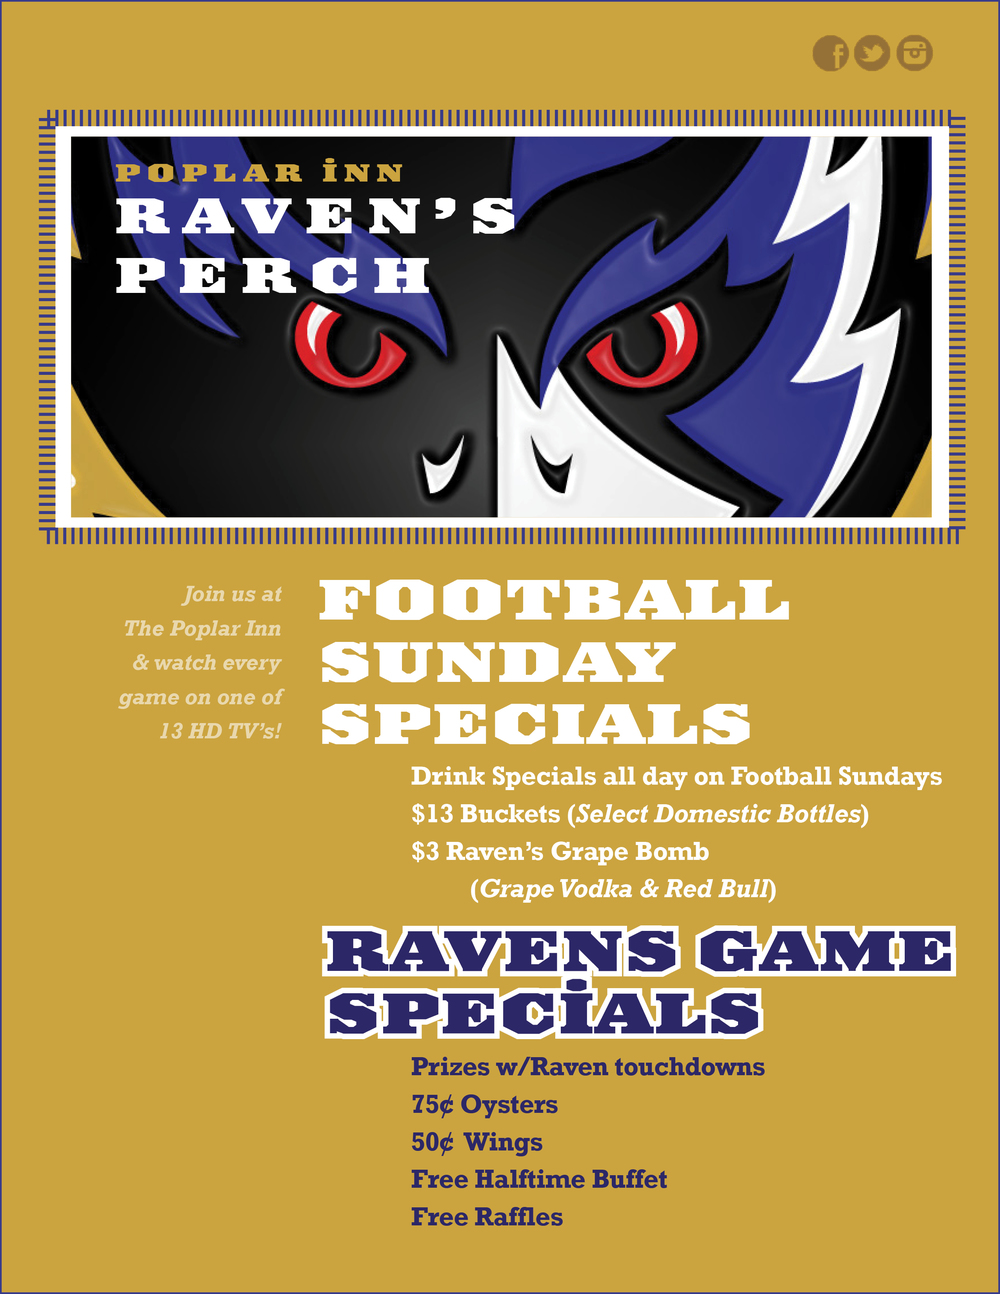 Gameday Specials!